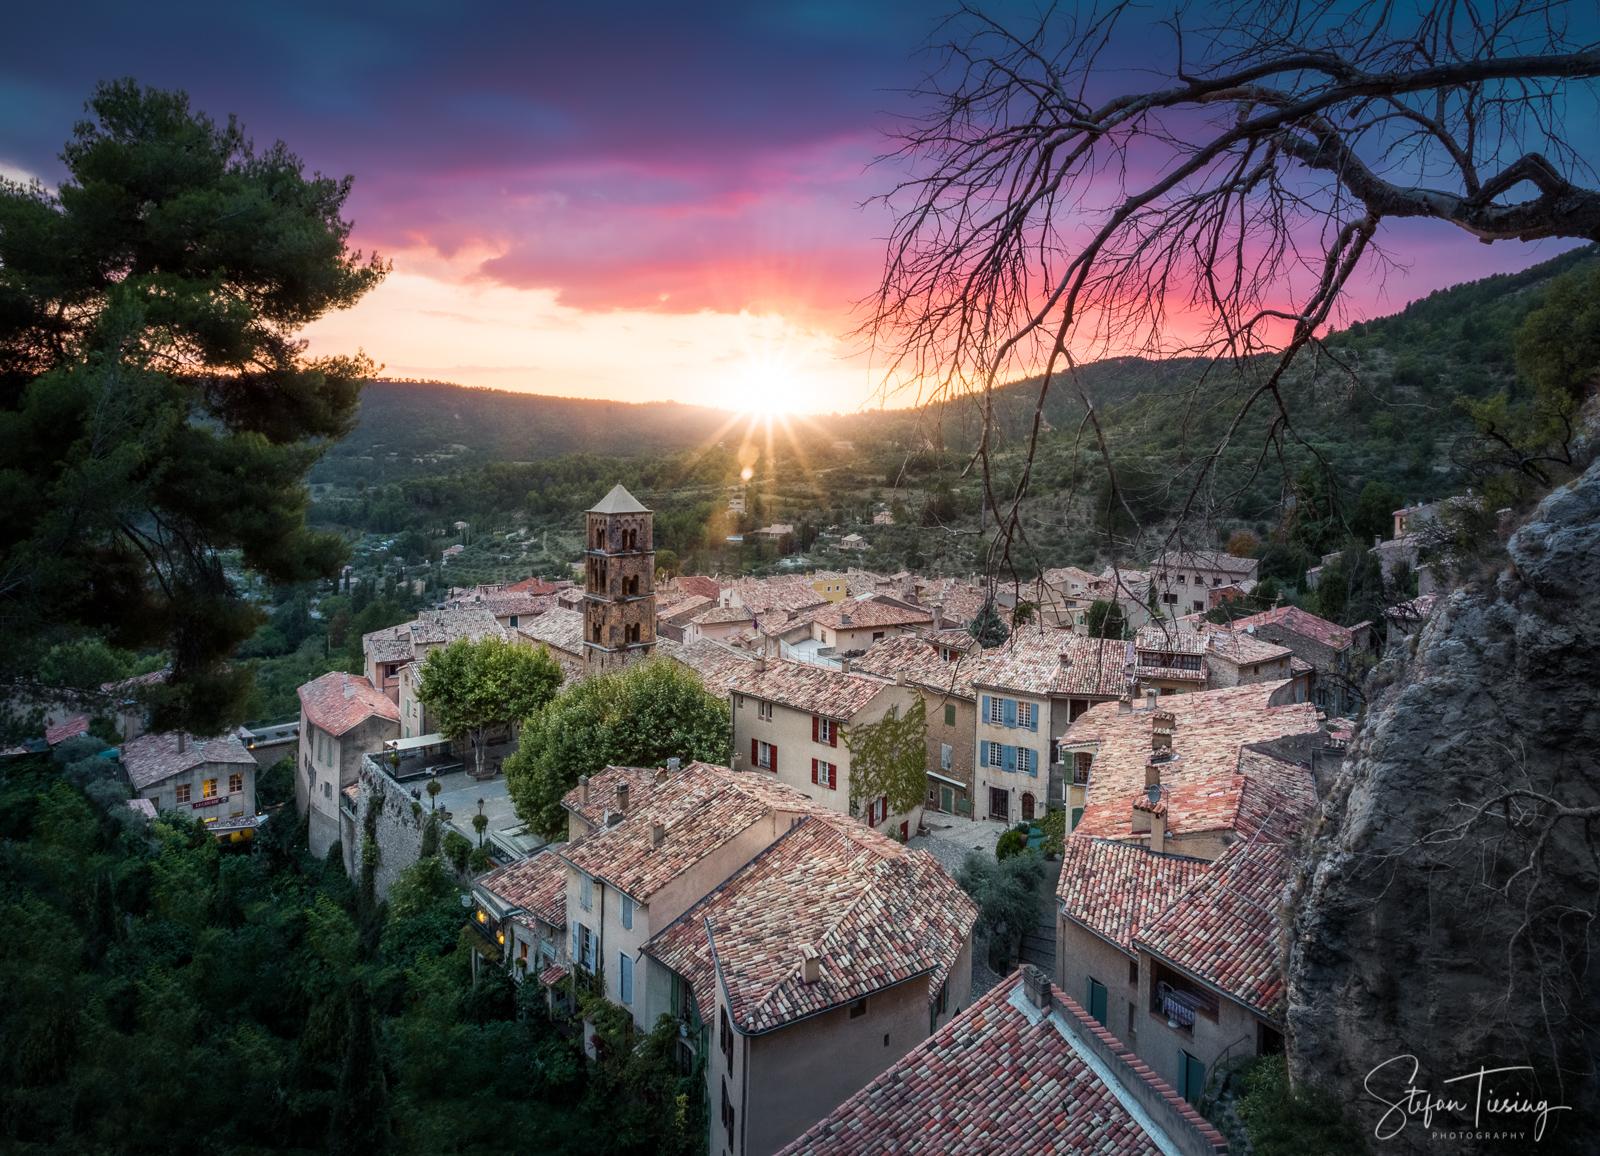 Sonnenuntergang über Moustiers-Sainte-Marie